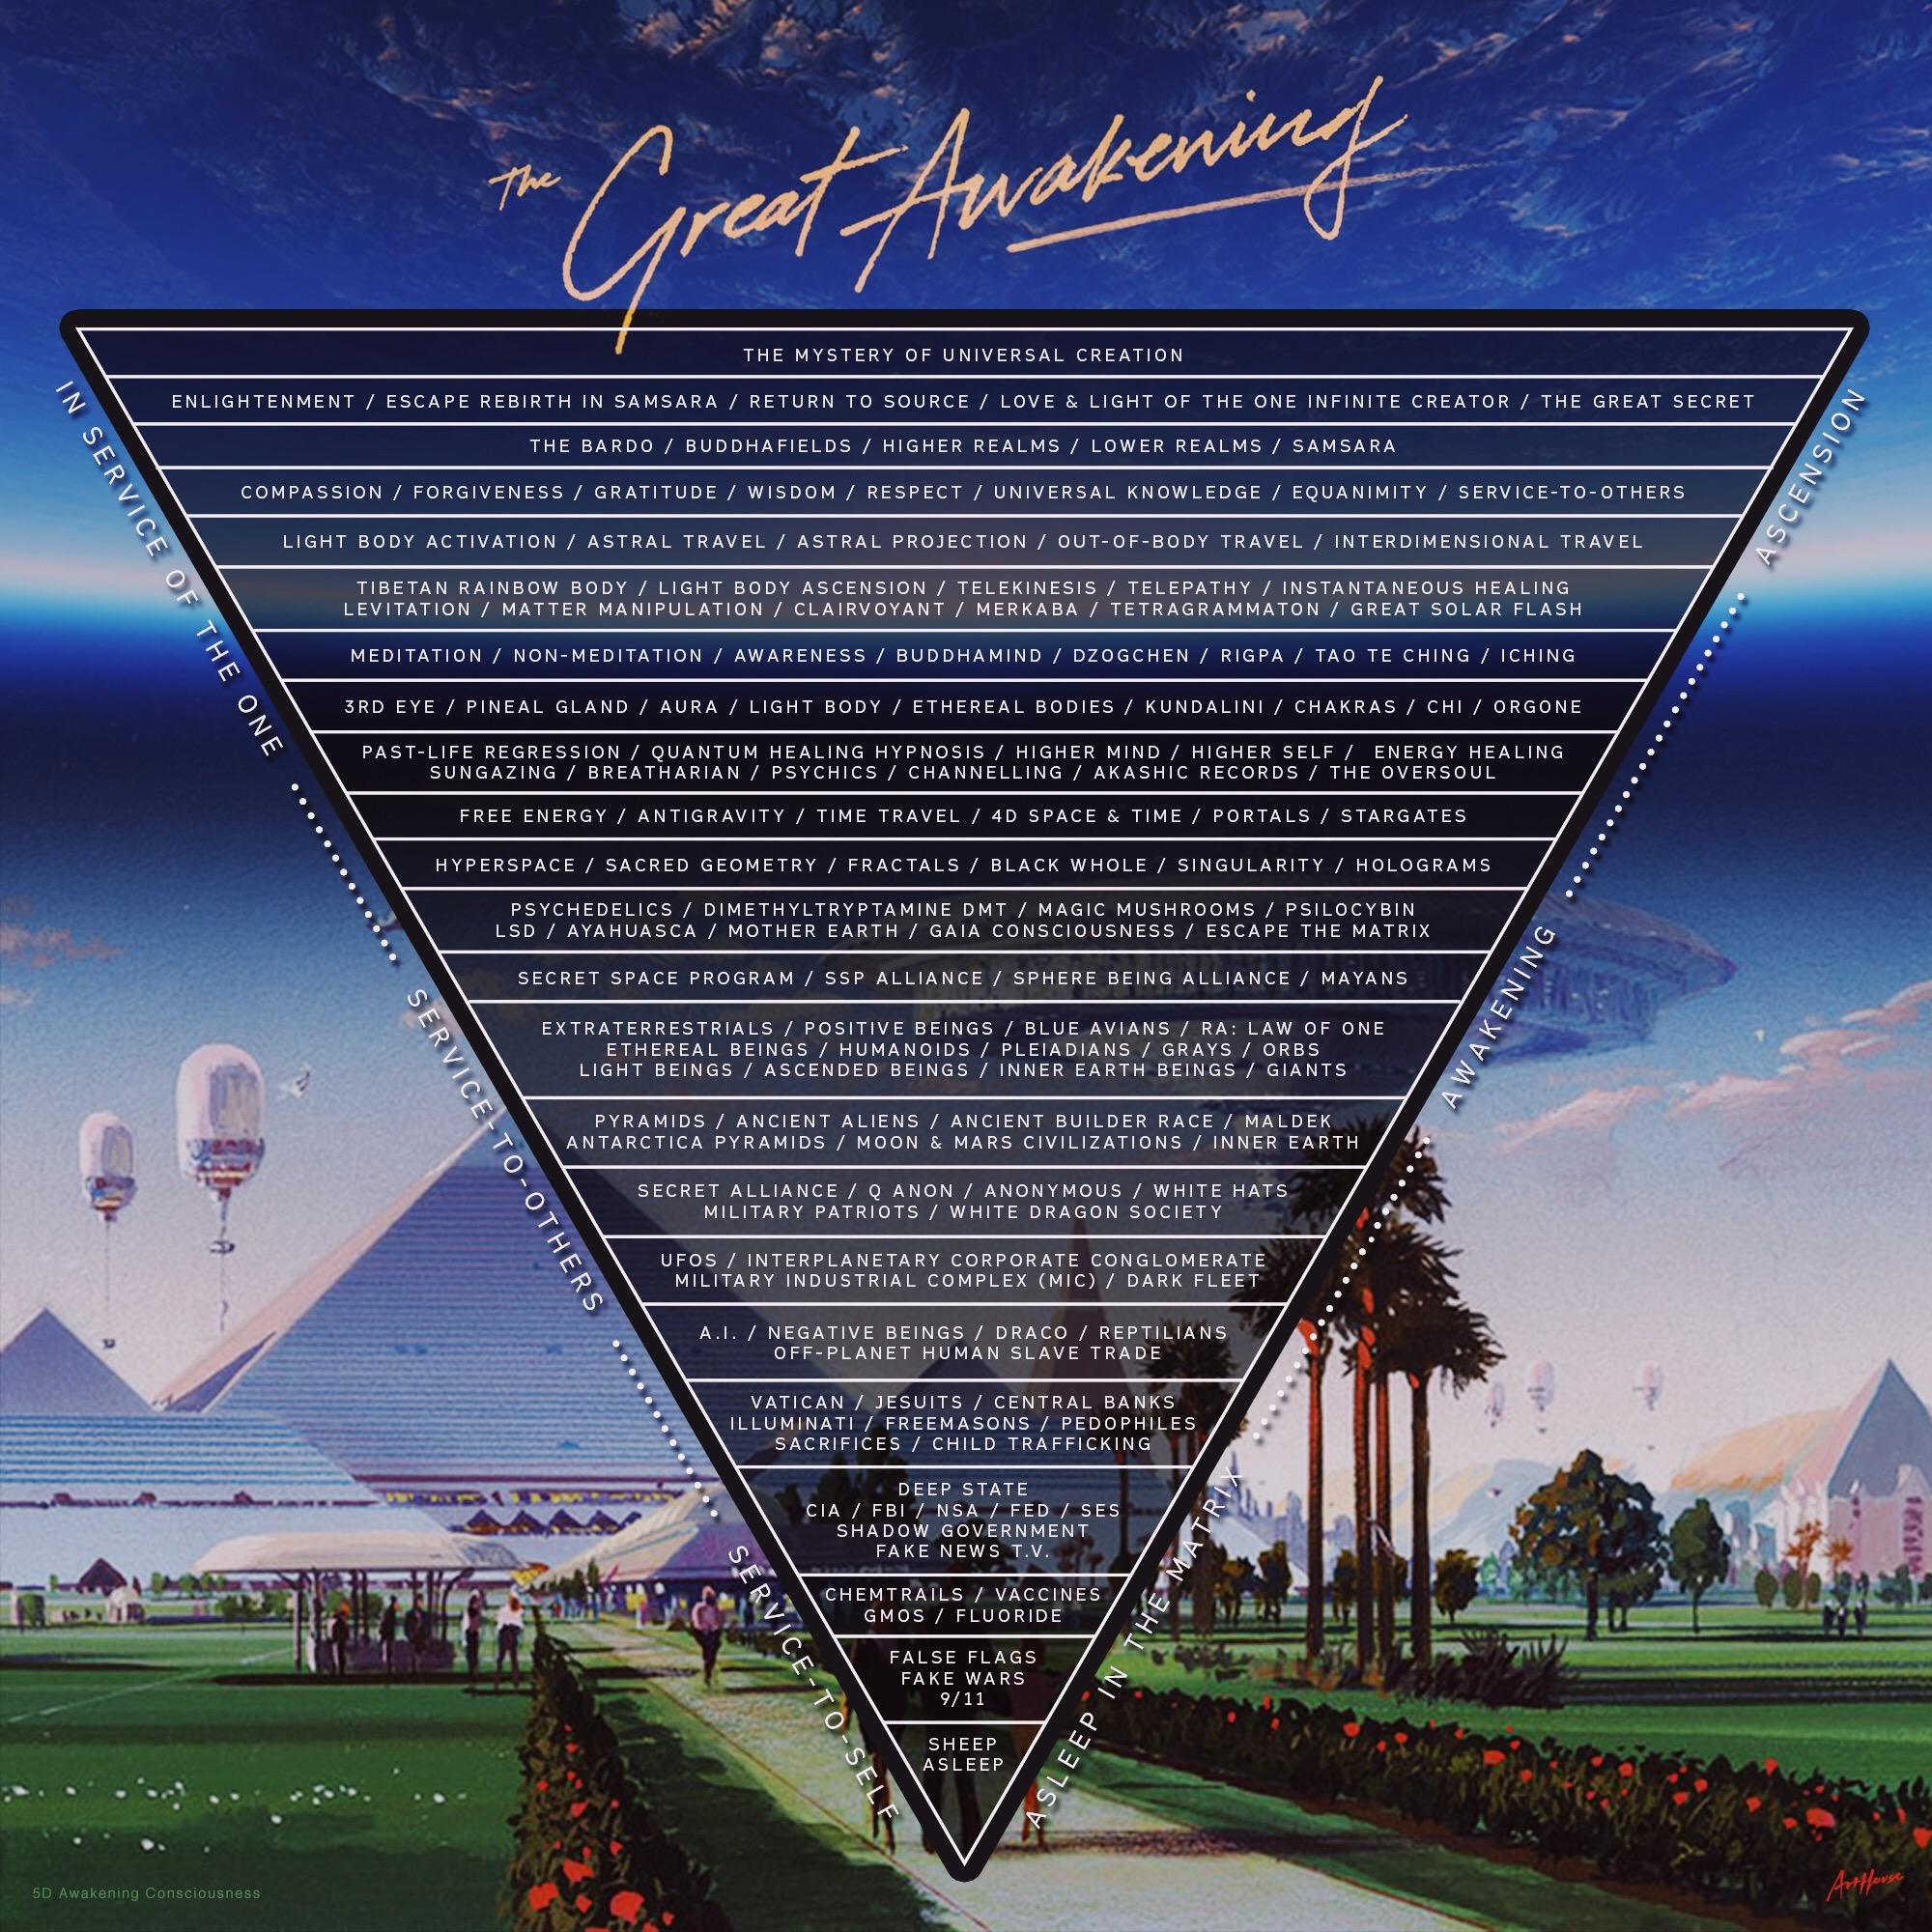 Great Awakening Pyramid